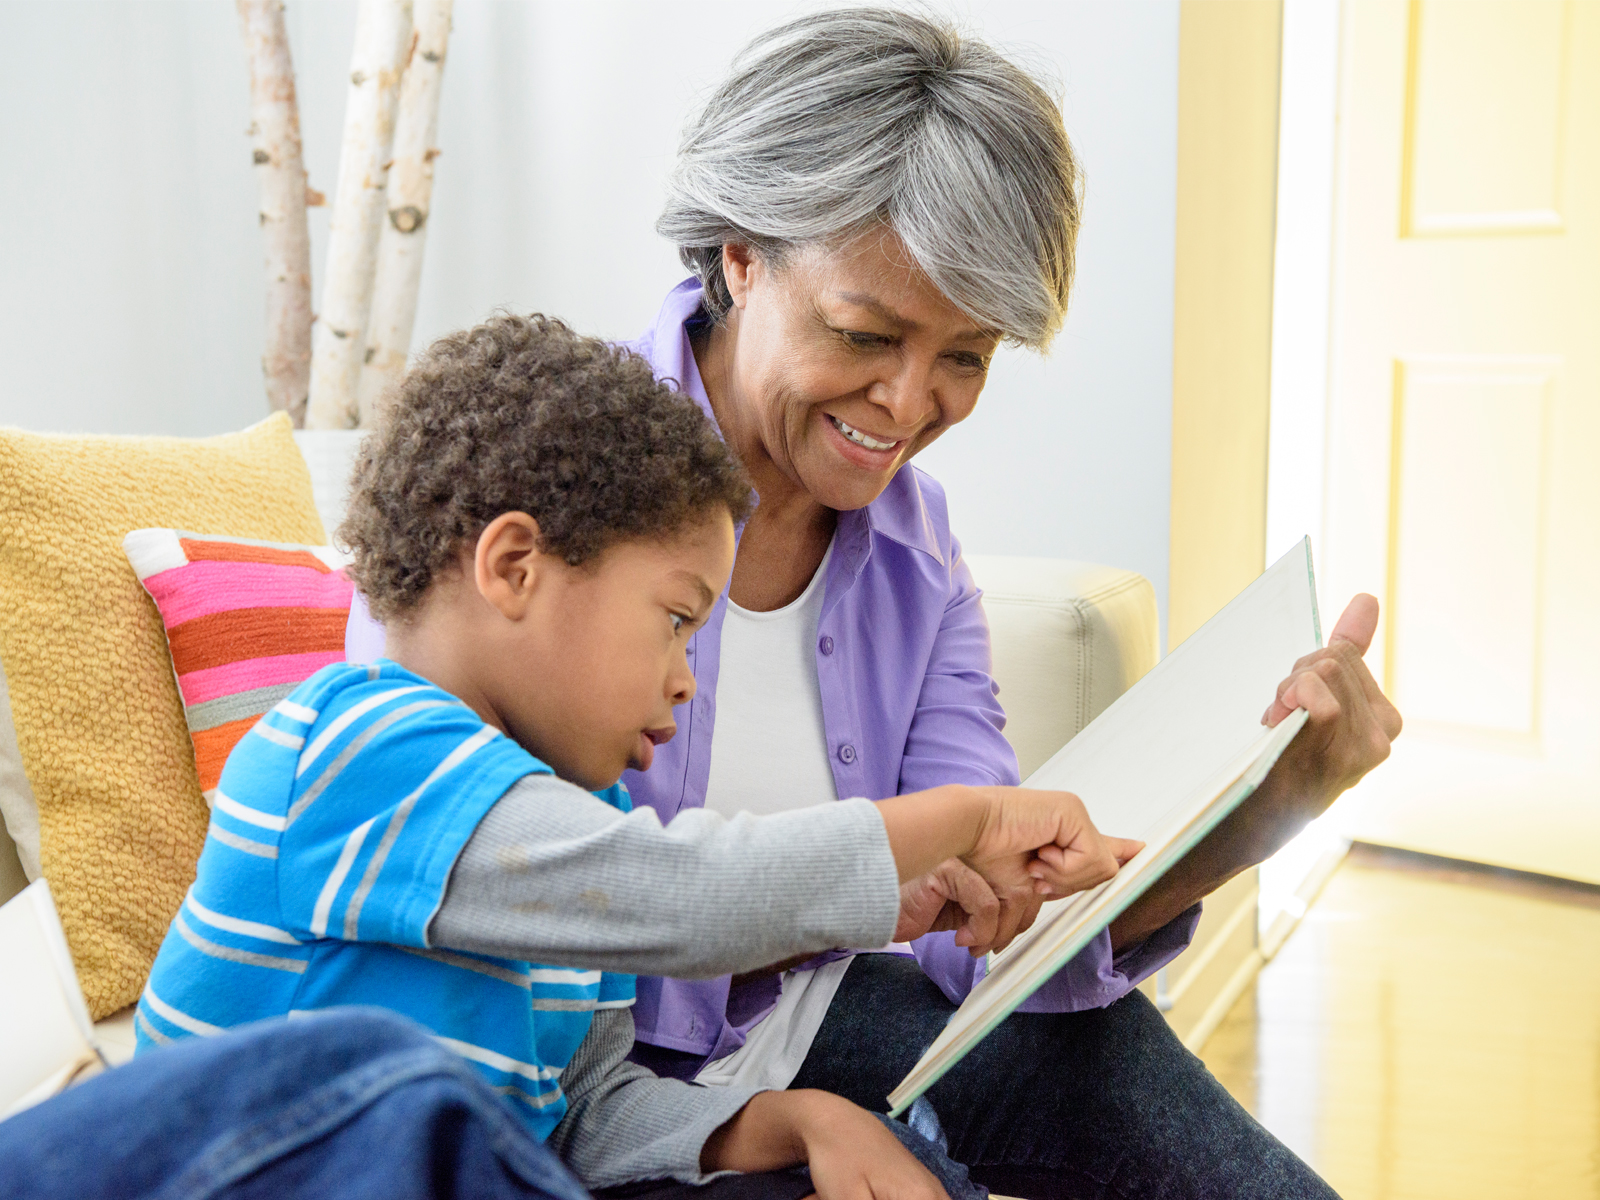 os-avos-podem-ter-grande-influencia-na-educacao-dos-netos